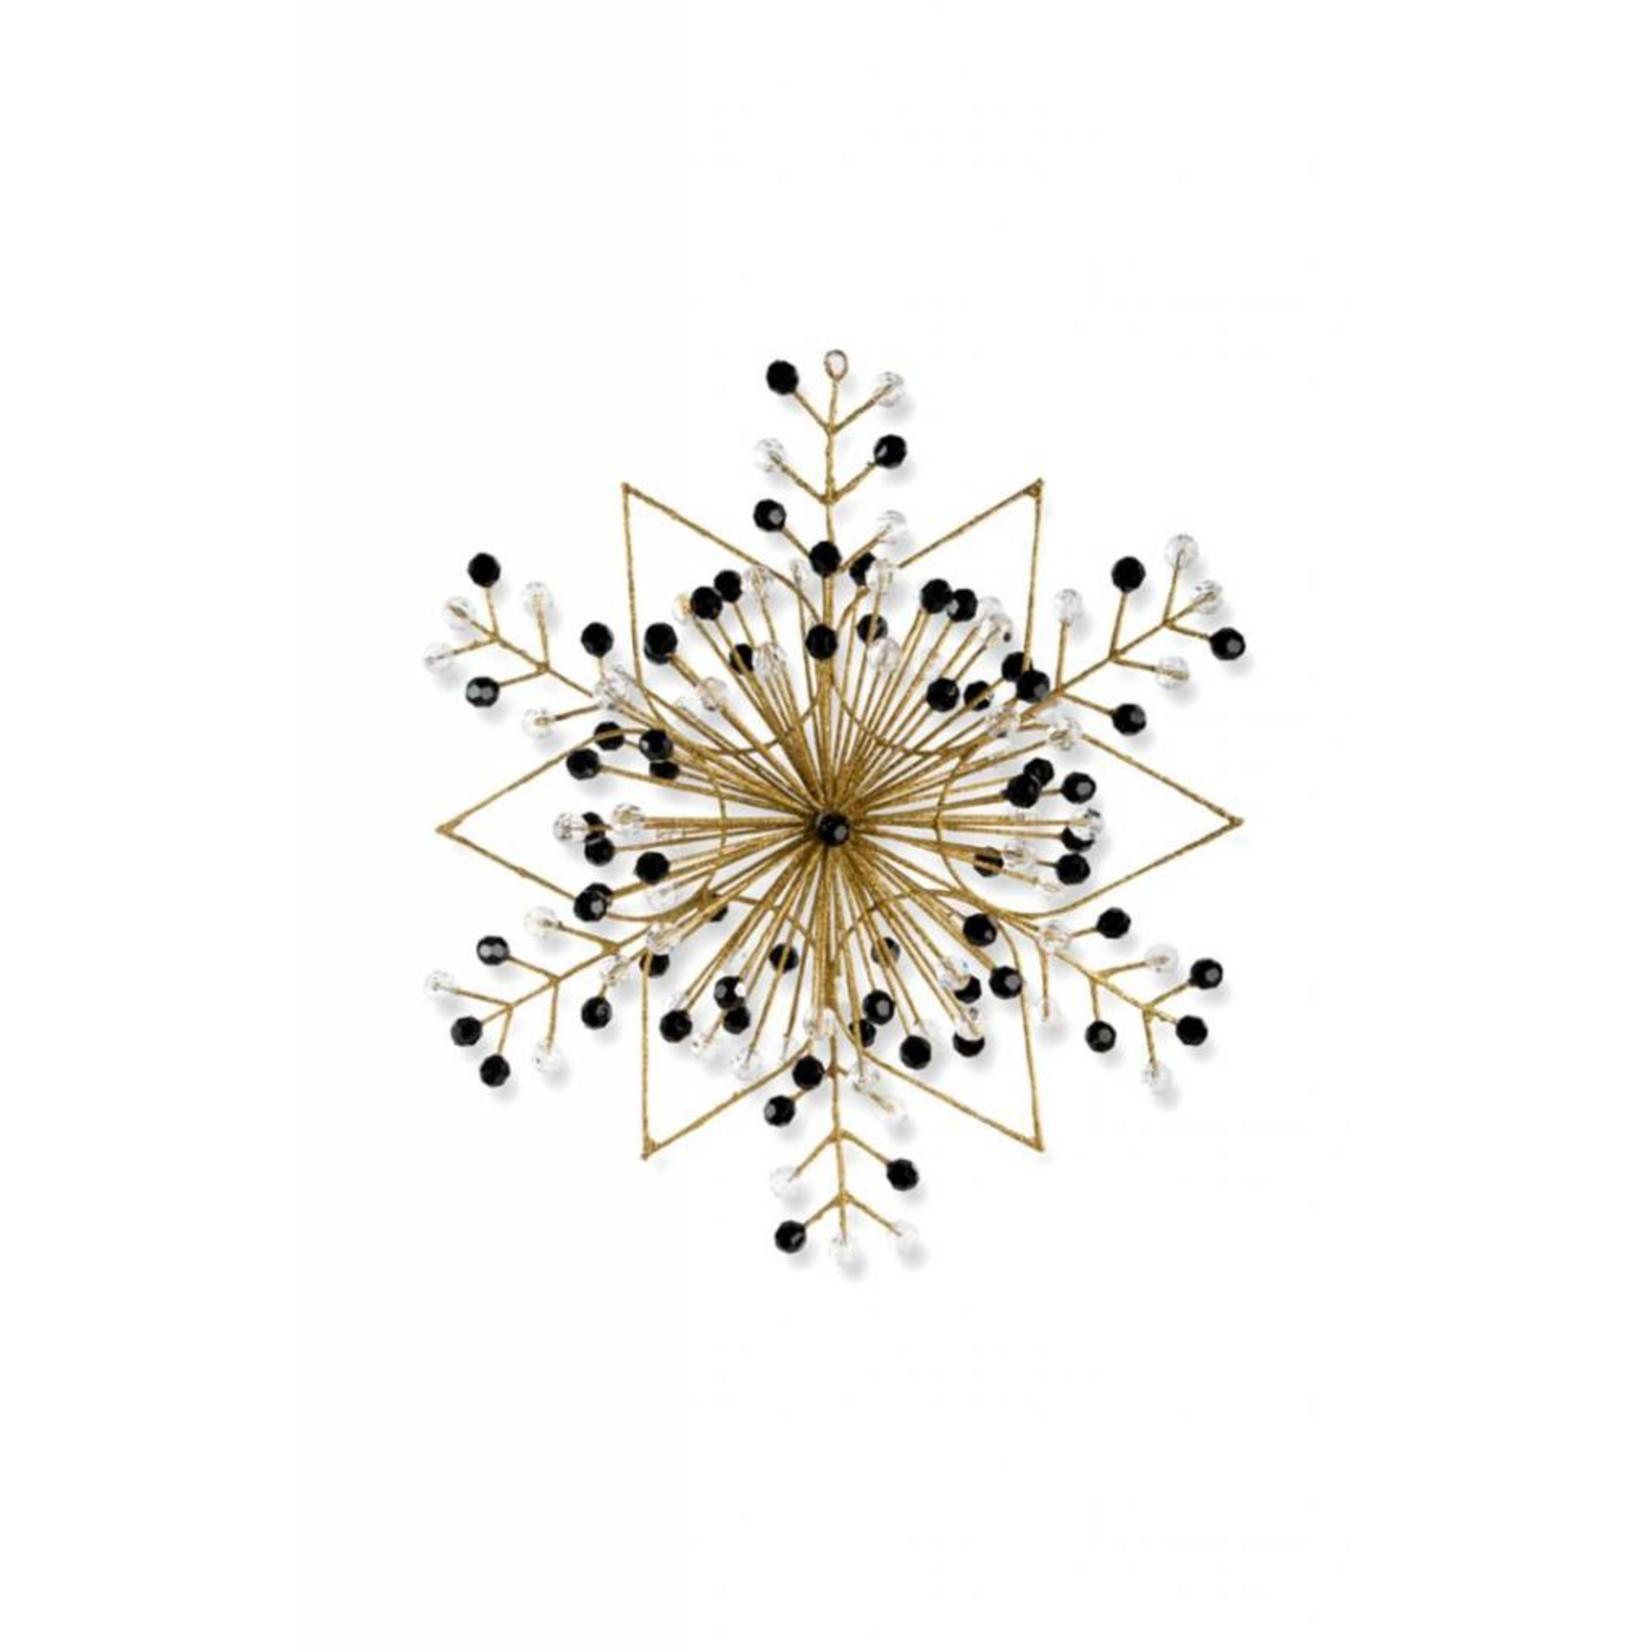 MacKenzie Childs Gold Snowflake Ornament - Large